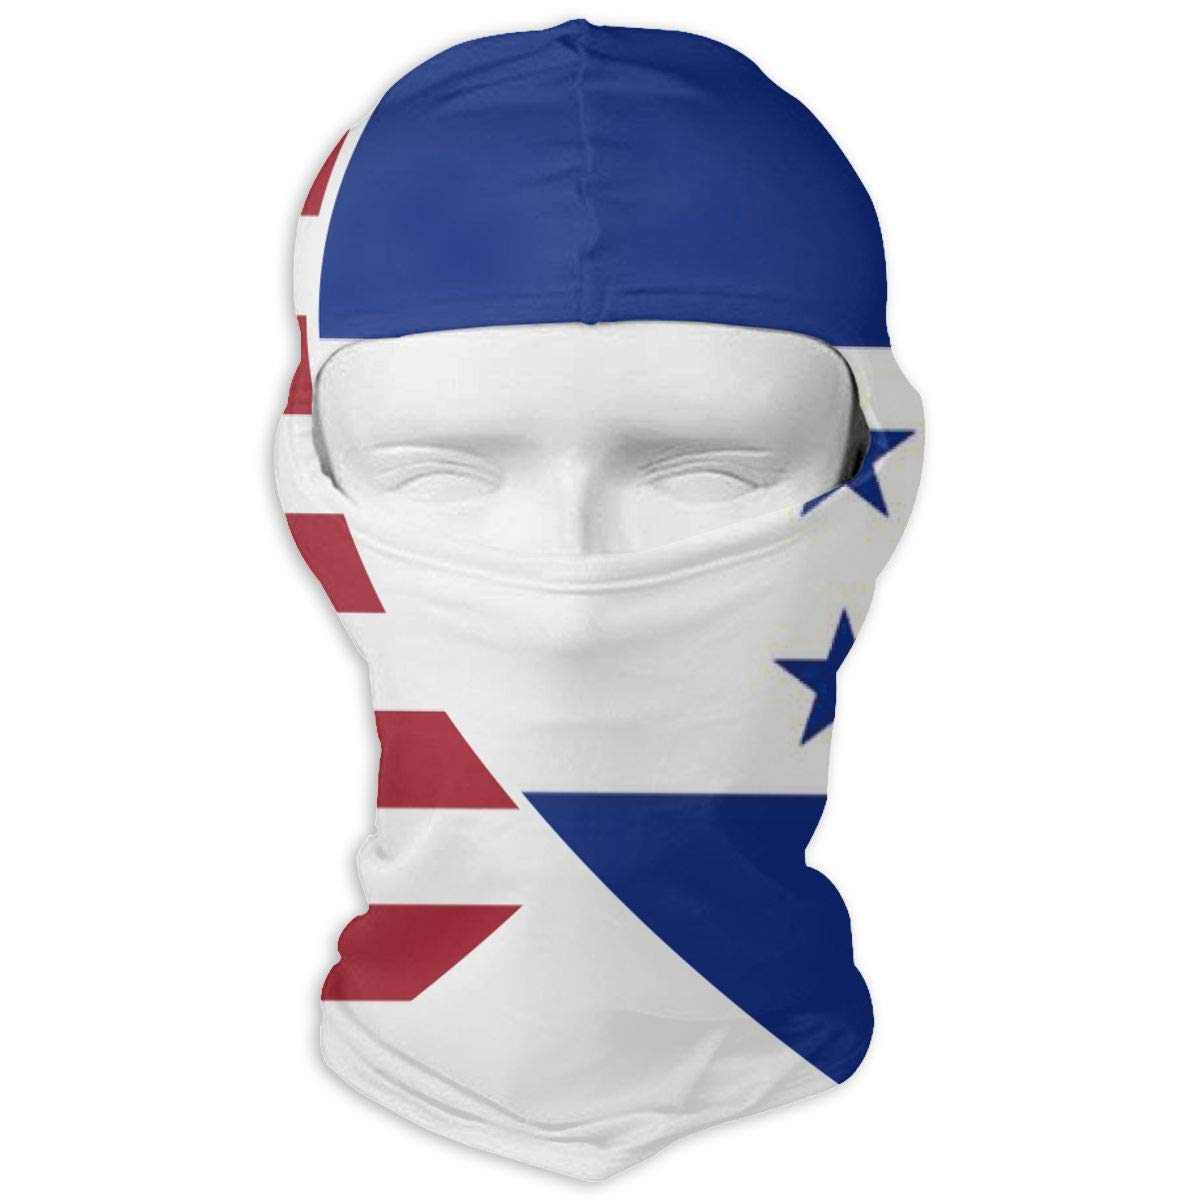 Giinly Honduras USA Flag Twin Heart Outdoor Cycling Ski Motorcycle Balaclava Mask Sunscreen Hat Windproof Cap